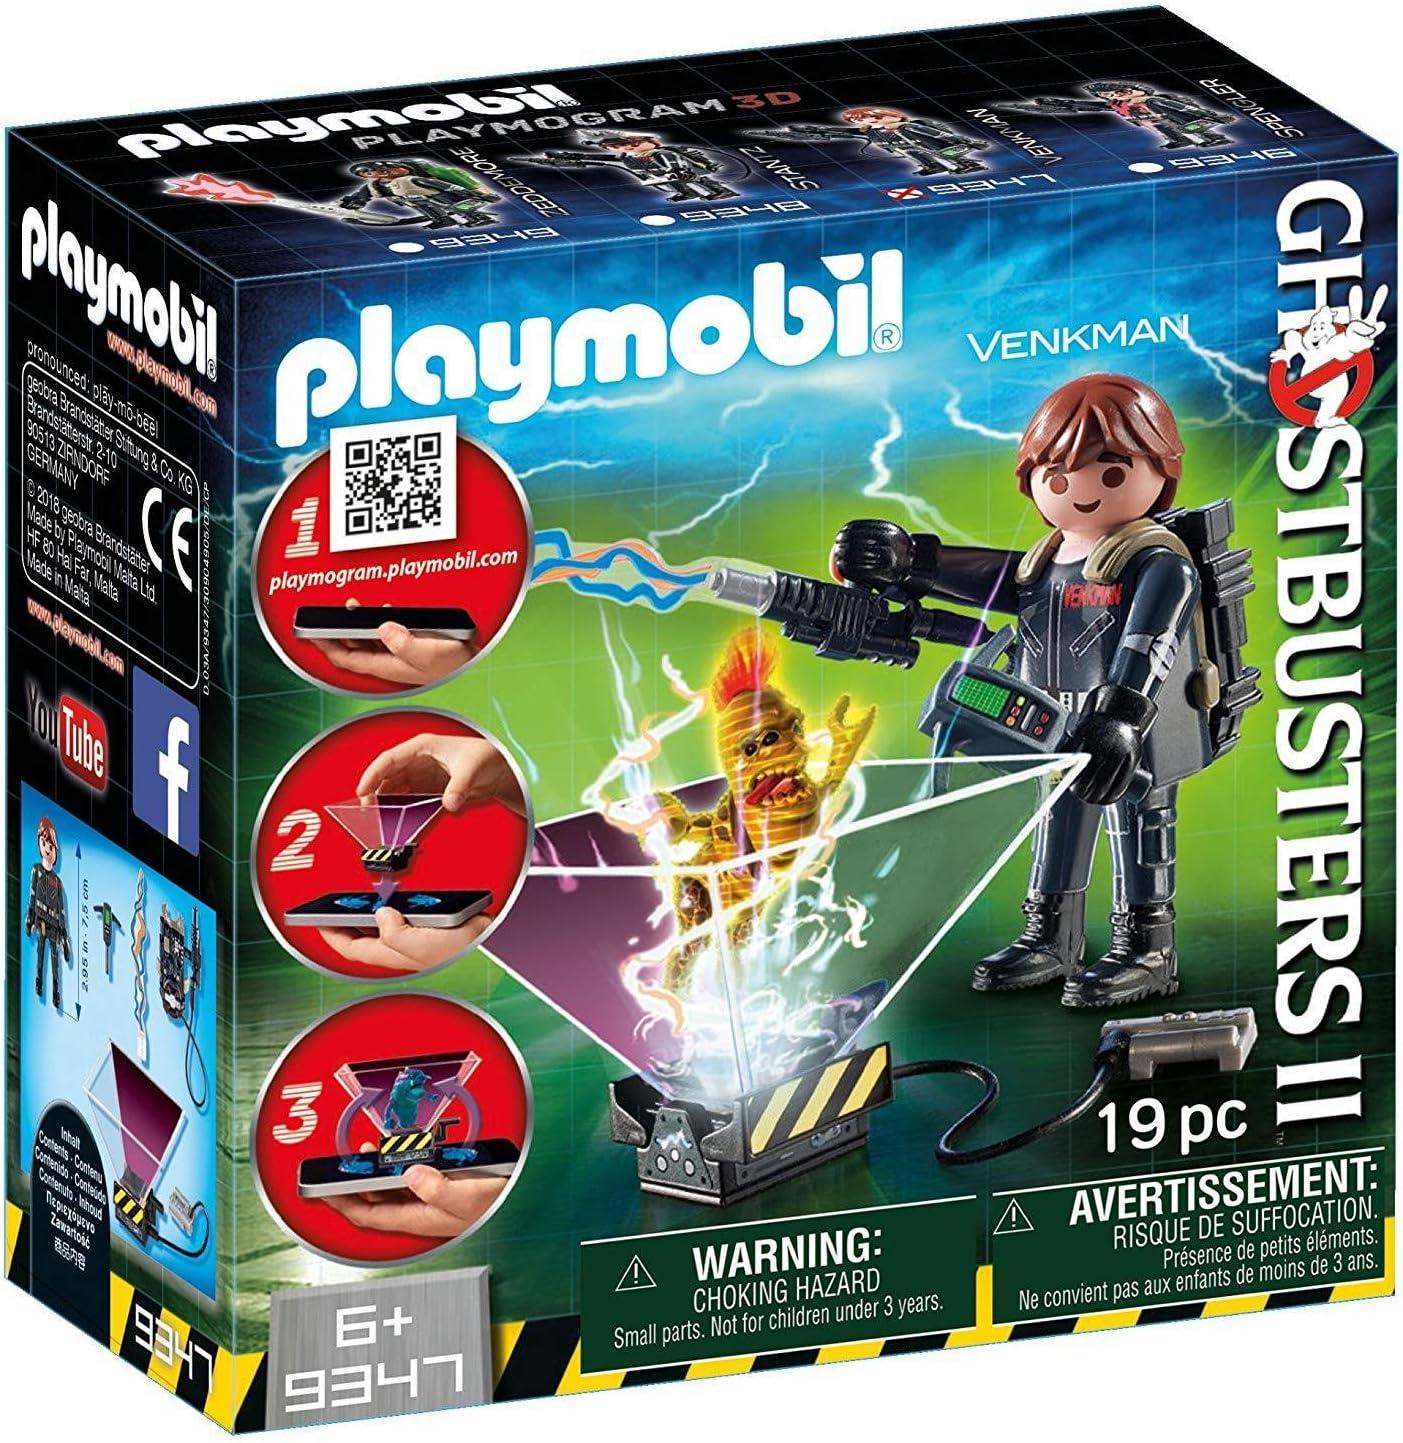 CAZAFANTASMAS-Ghostbuster Peter Venkman Playset de Figuras de Juguete, Multicolor, 7 x 14,4 x 14,6 cm Playmobil 9347